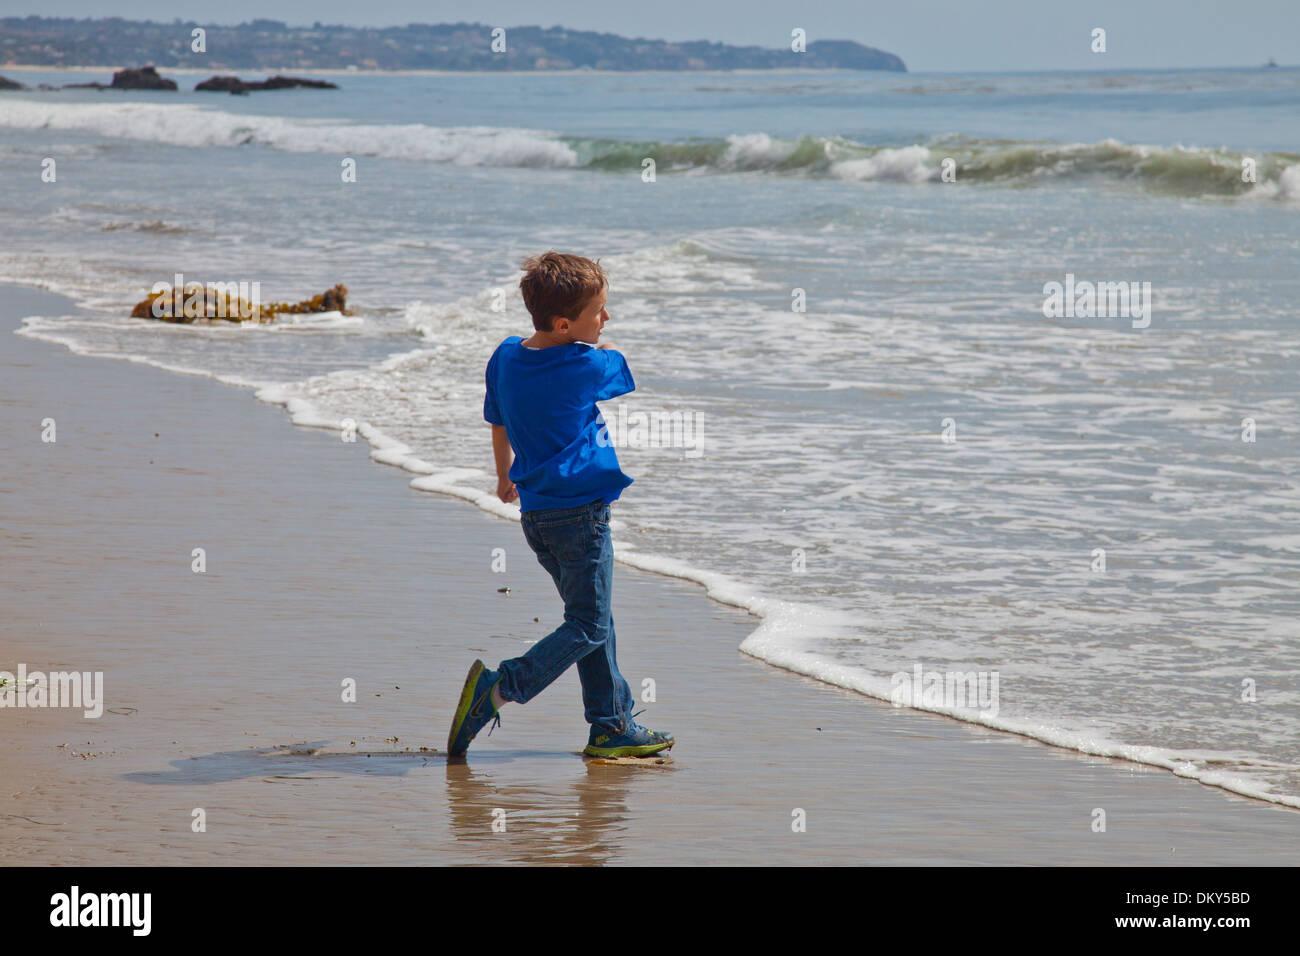 Boy throwing skipping rocks, El Matador State Beach, Malibu, Los Angeles County, California (MR) - Stock Image